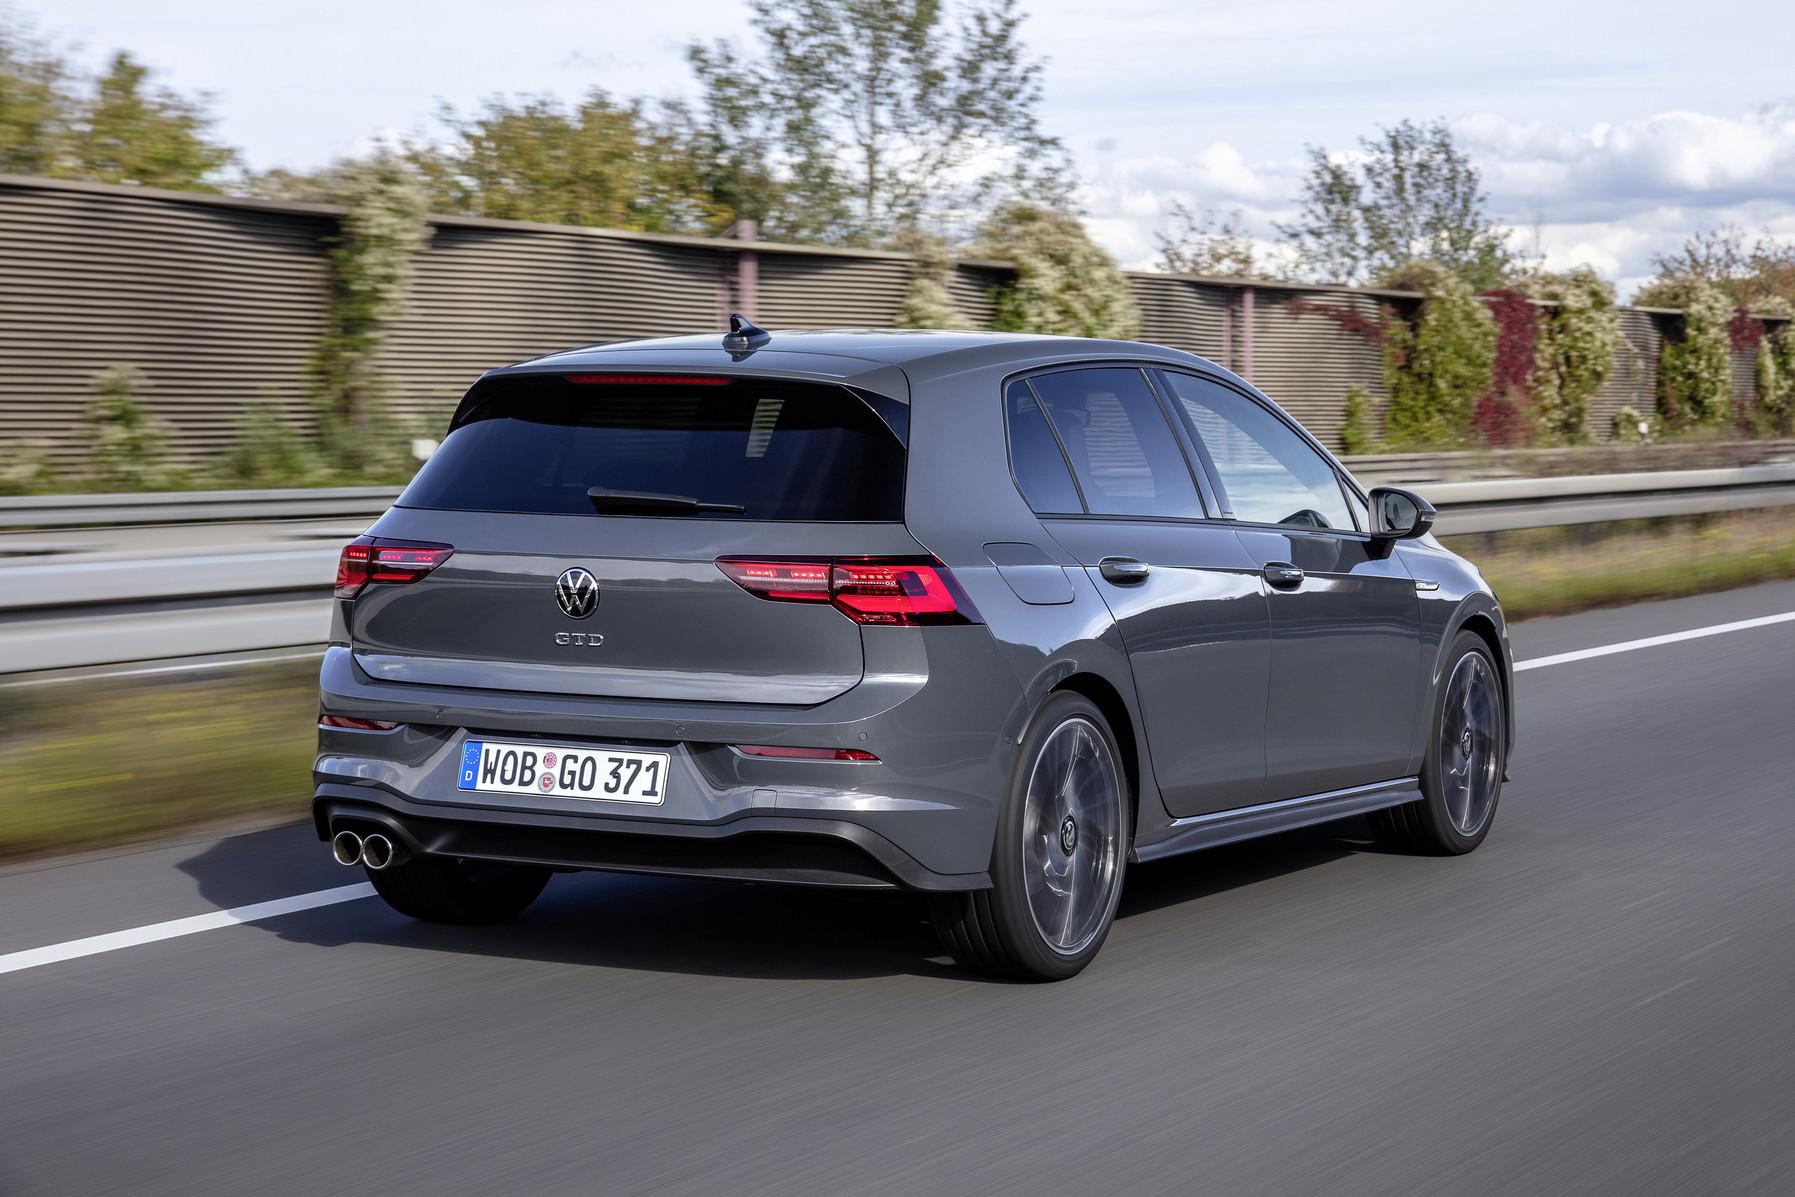 Volkswagen Golf 8 Gtd Les Tarifs Francais Enfin Devoiles